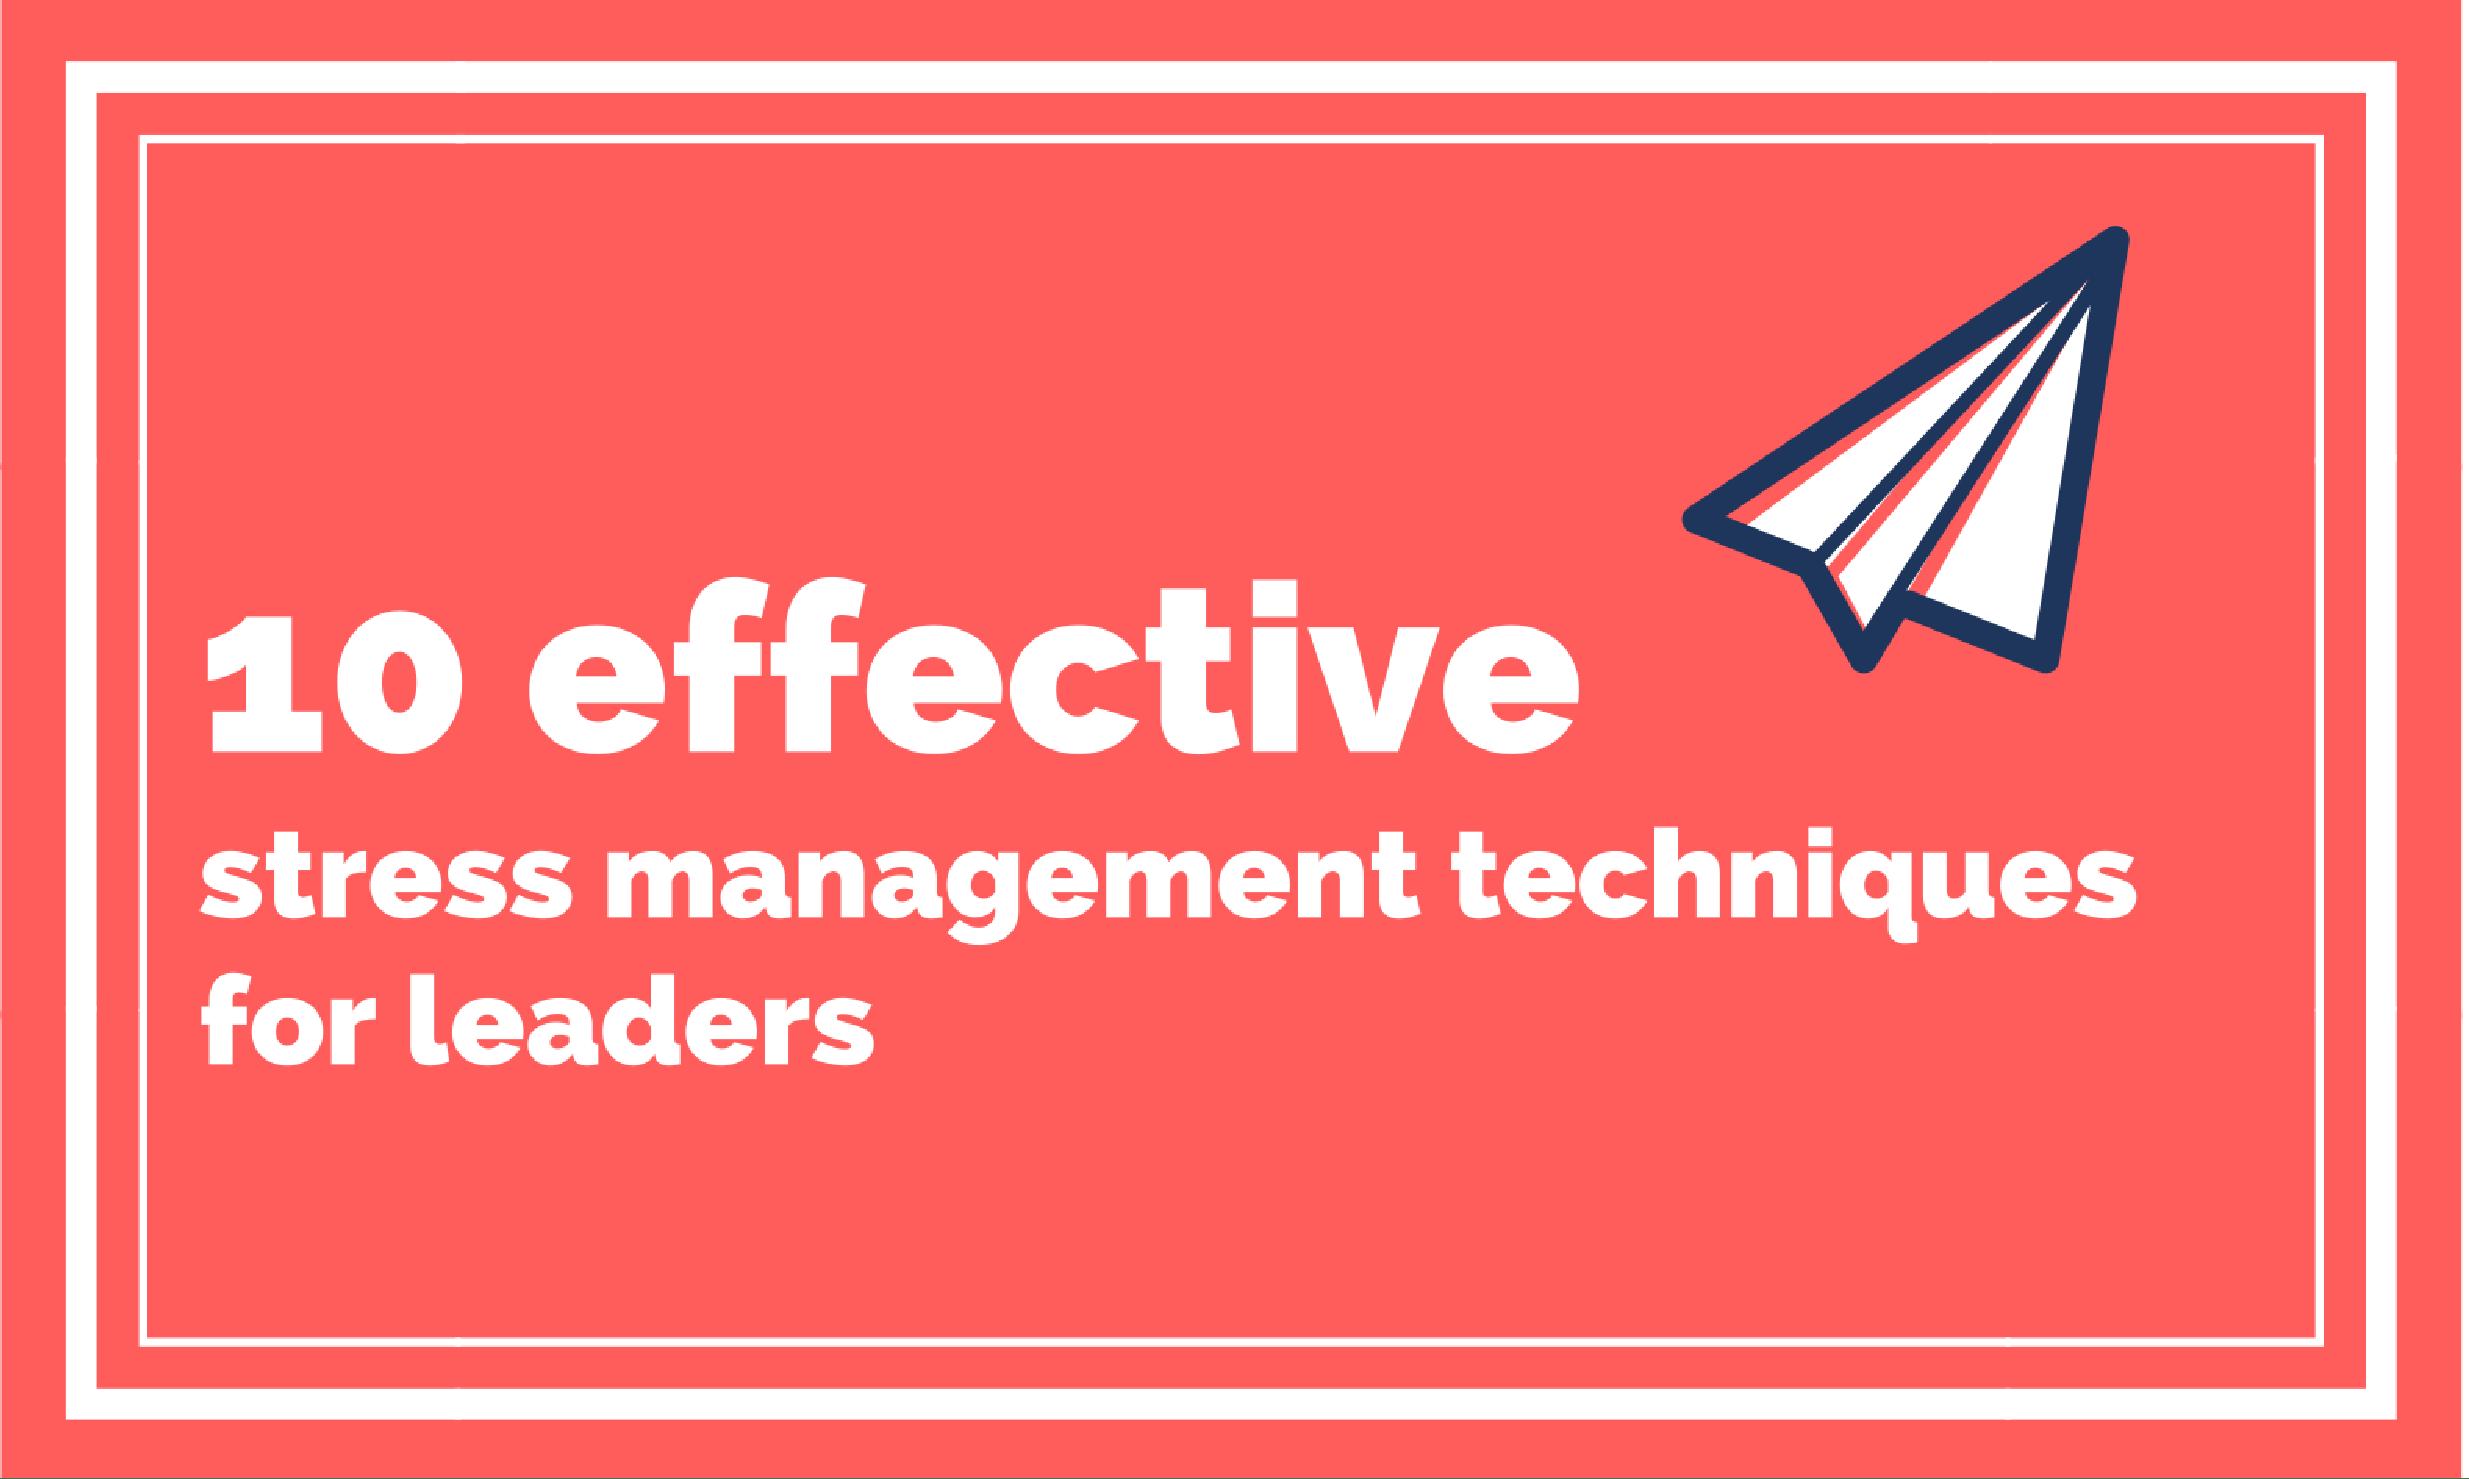 10 Effective Stress Management Techniques For Leaders